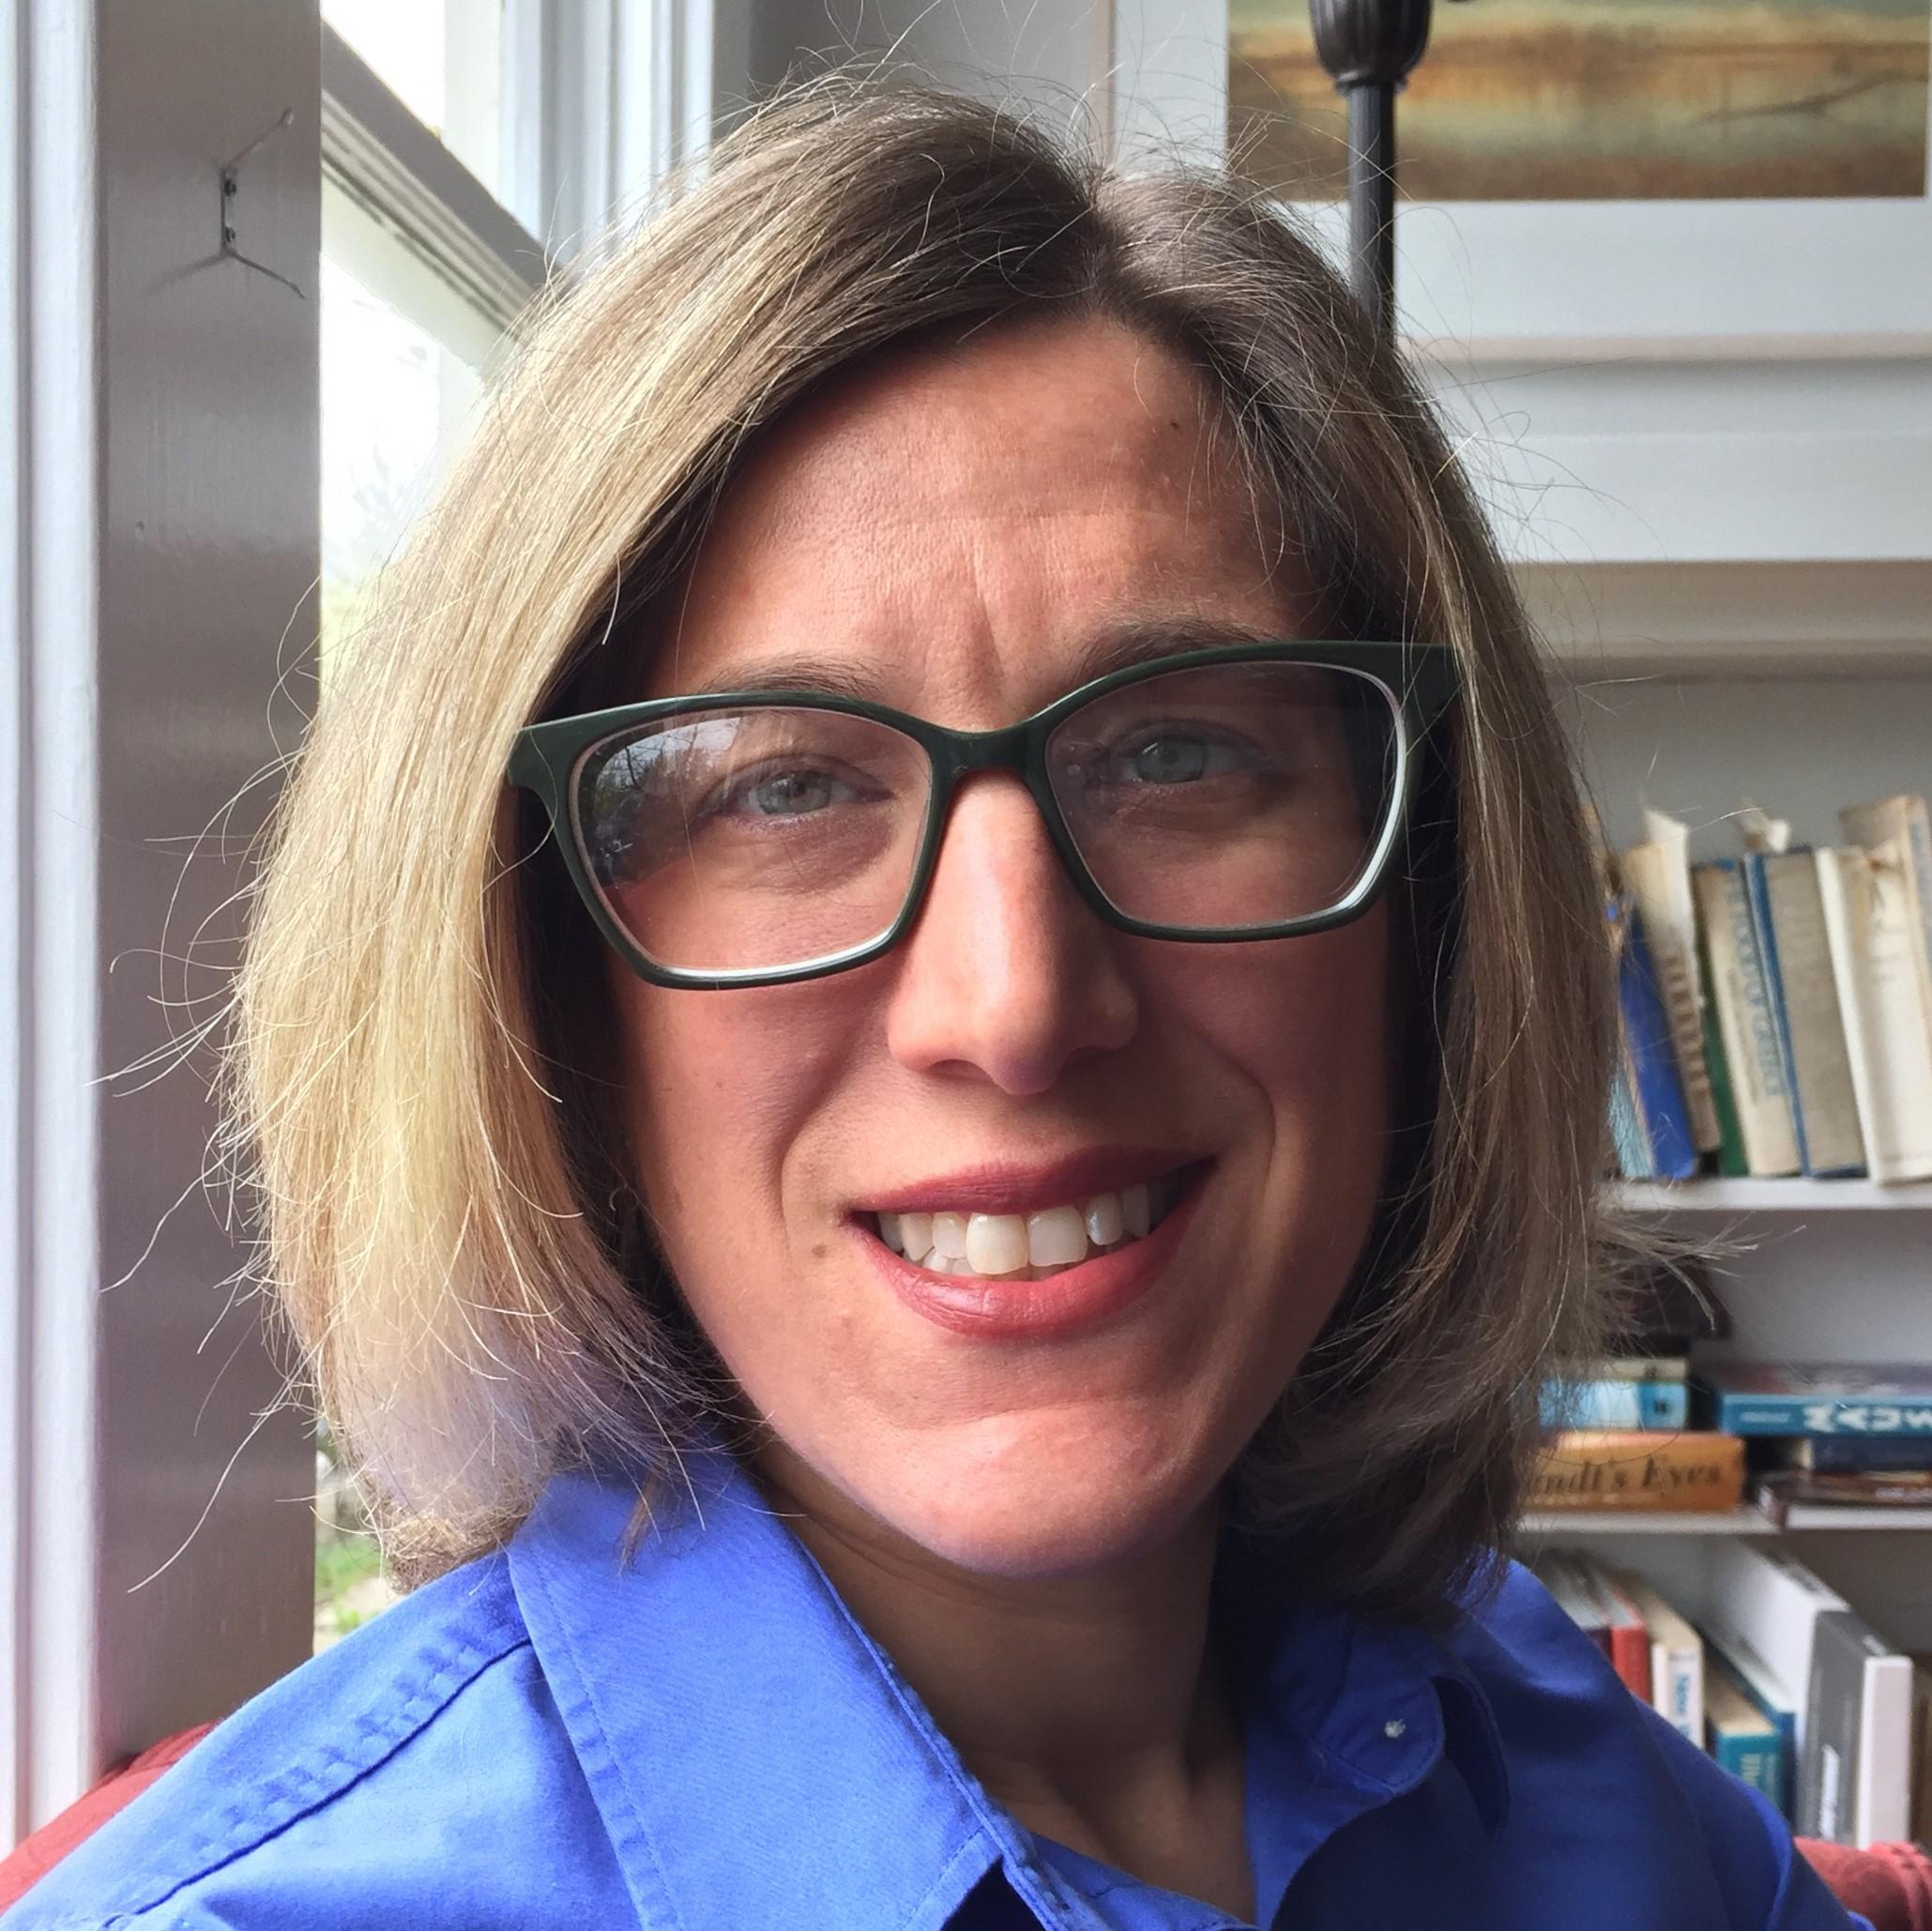 Ursula Wolfe-Rocca